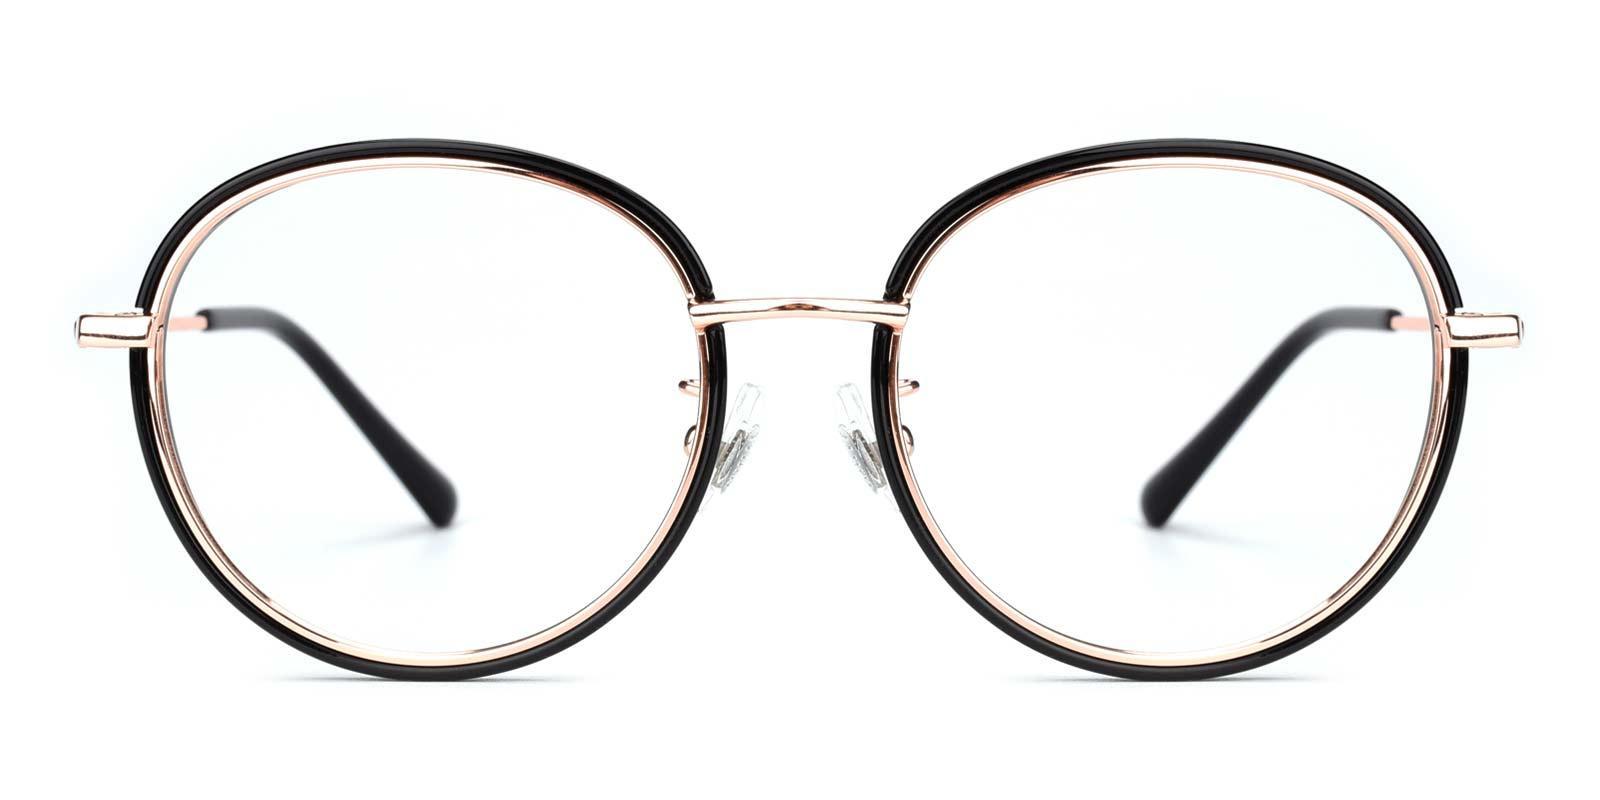 Soymilk-Black-Round-Titanium-Eyeglasses-detail